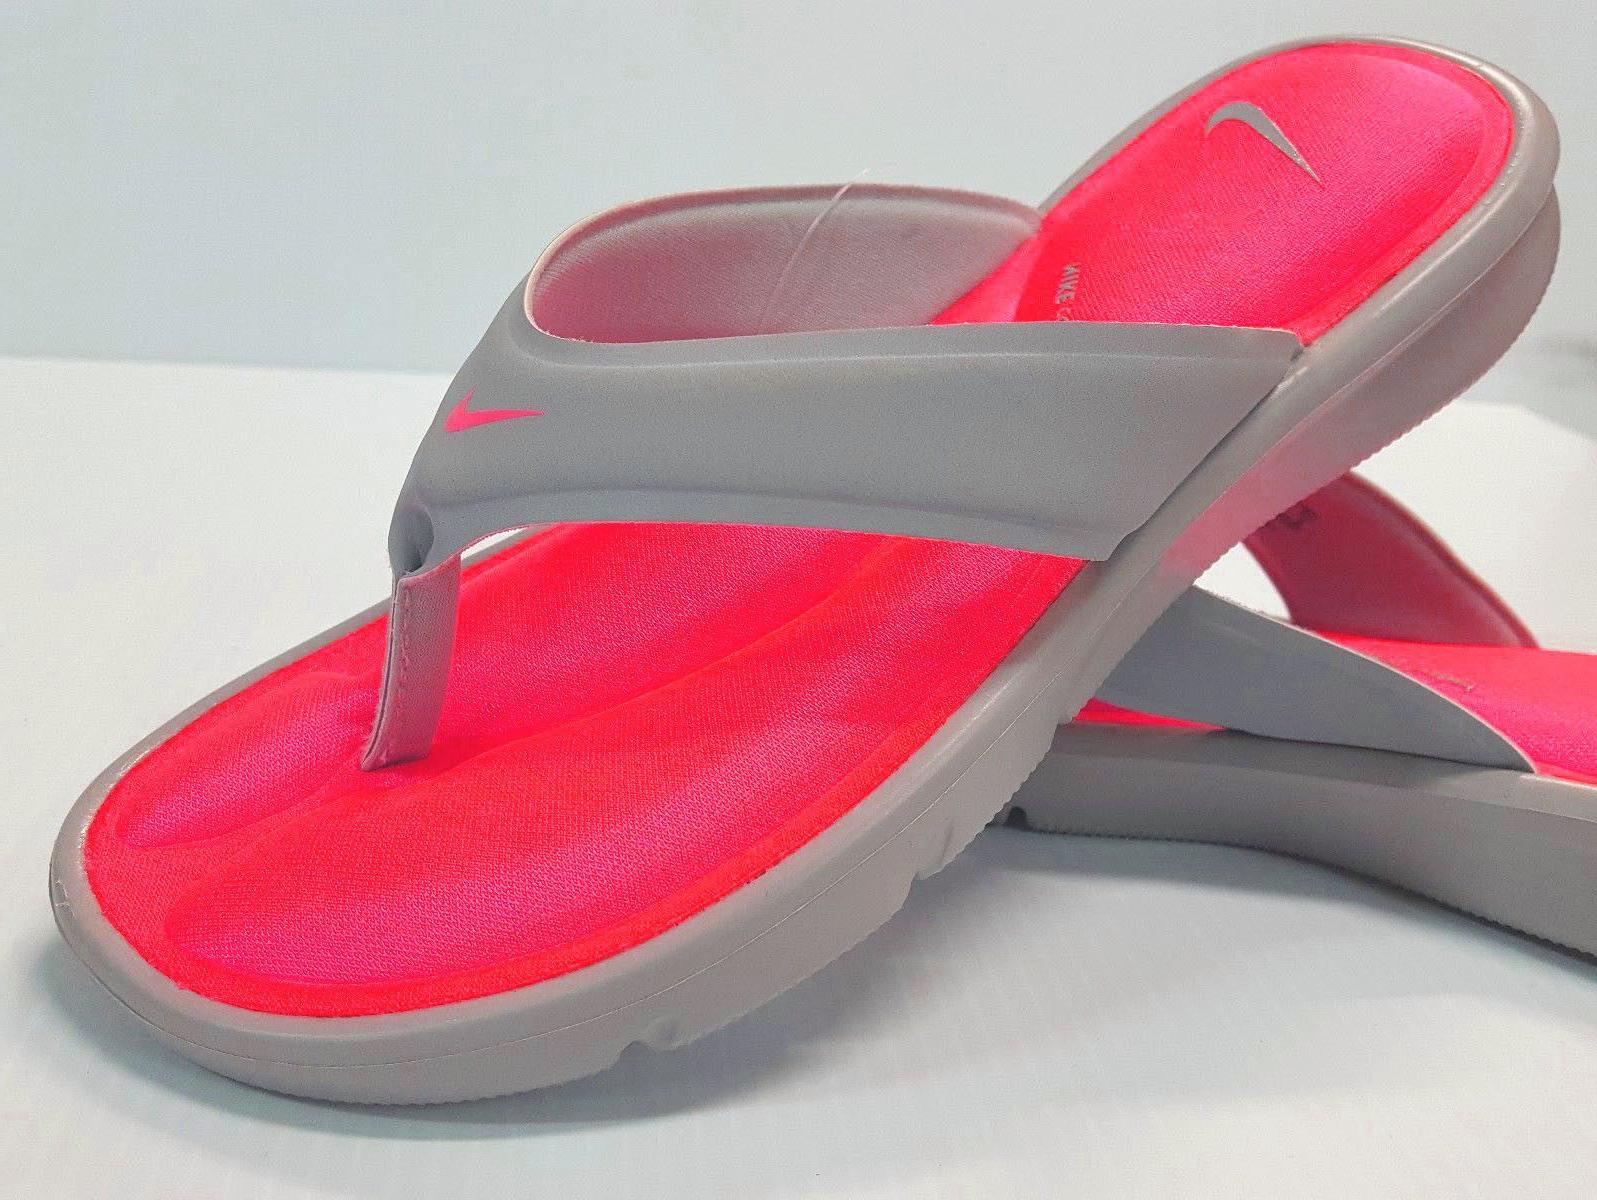 Nike Thong Flip-Flops Gray/Punch Size 6,7,8,9,10